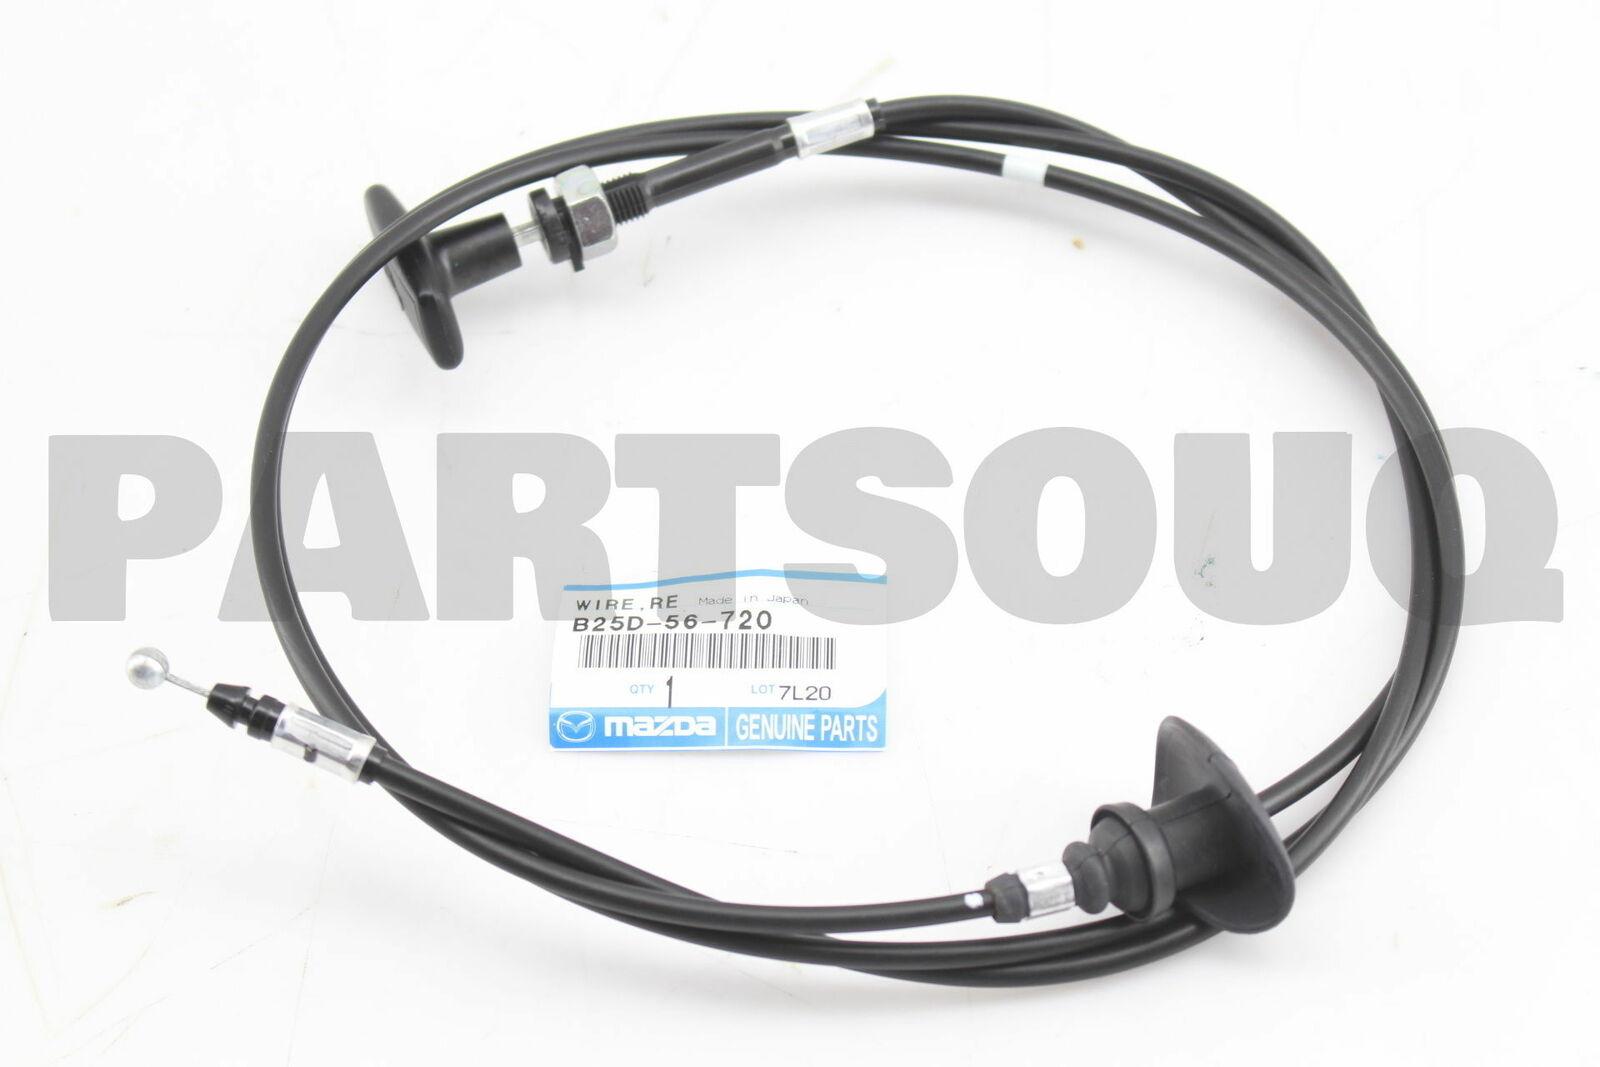 New Genuine OEM 2001-2009 Mazda 3 Wire Release-Bonnet BP4K-56-720C